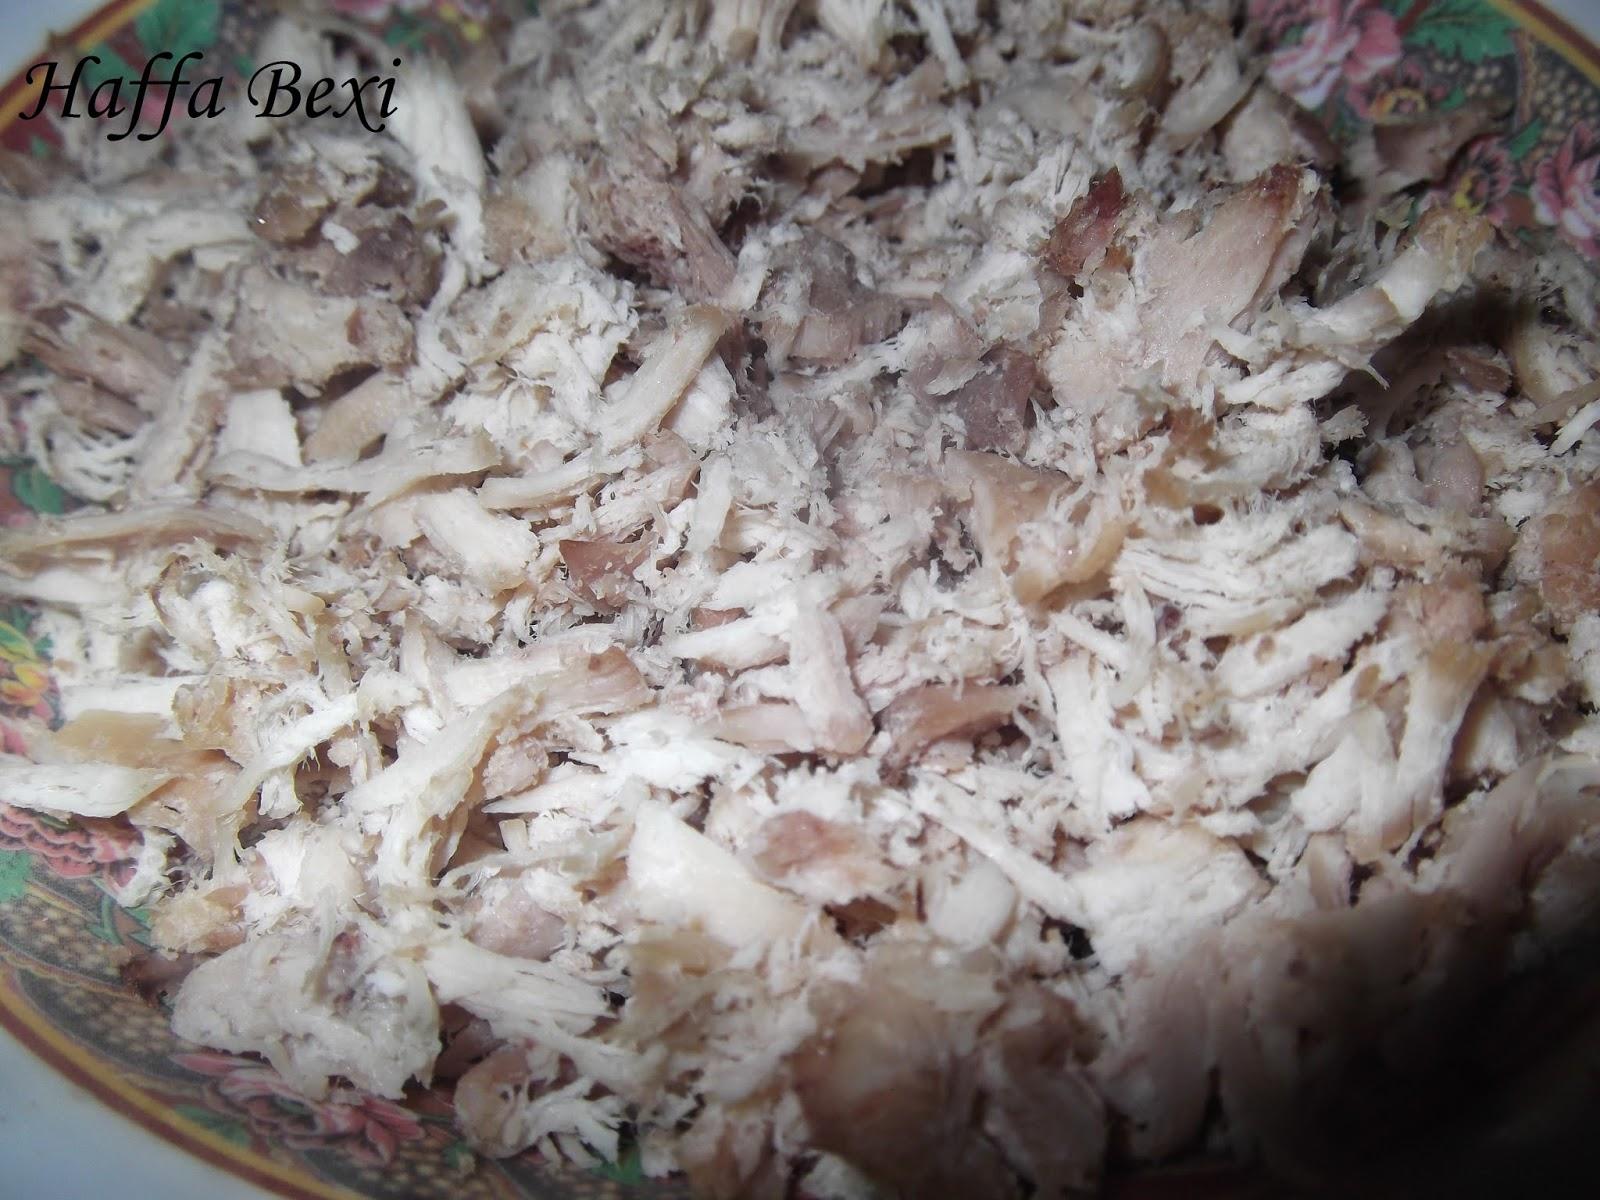 Diet haleem, Diet recipes, weight loss recipes, chicken pot pie, Chicken and Lentils Soup,